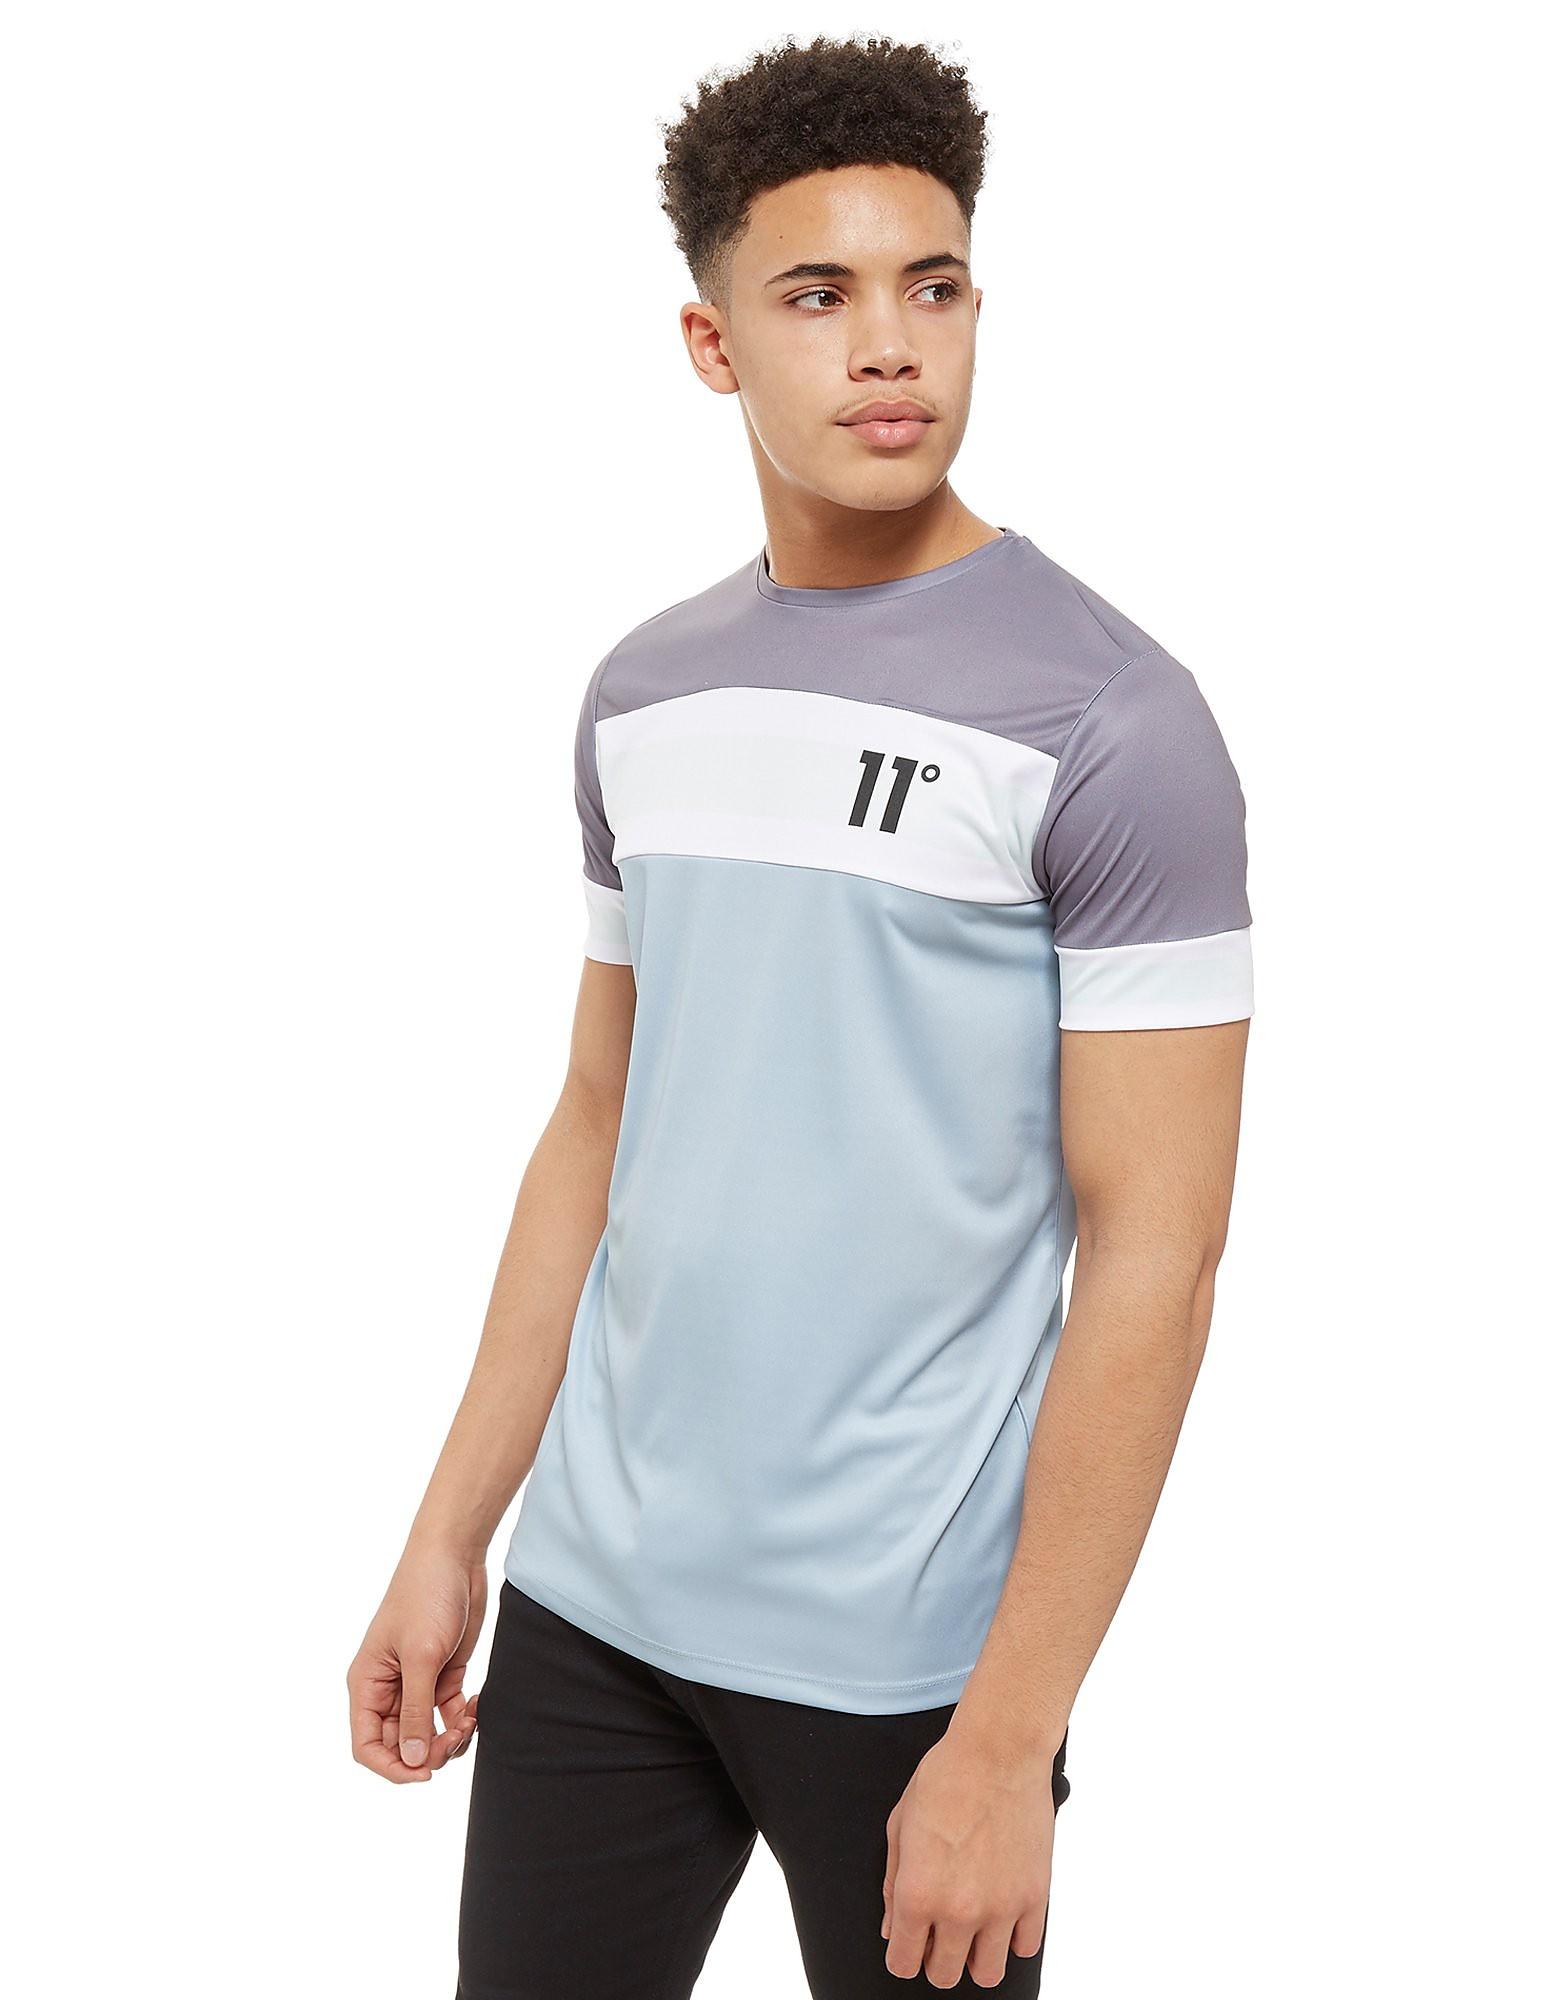 11 Degrees Tri-Tonal T-Shirt